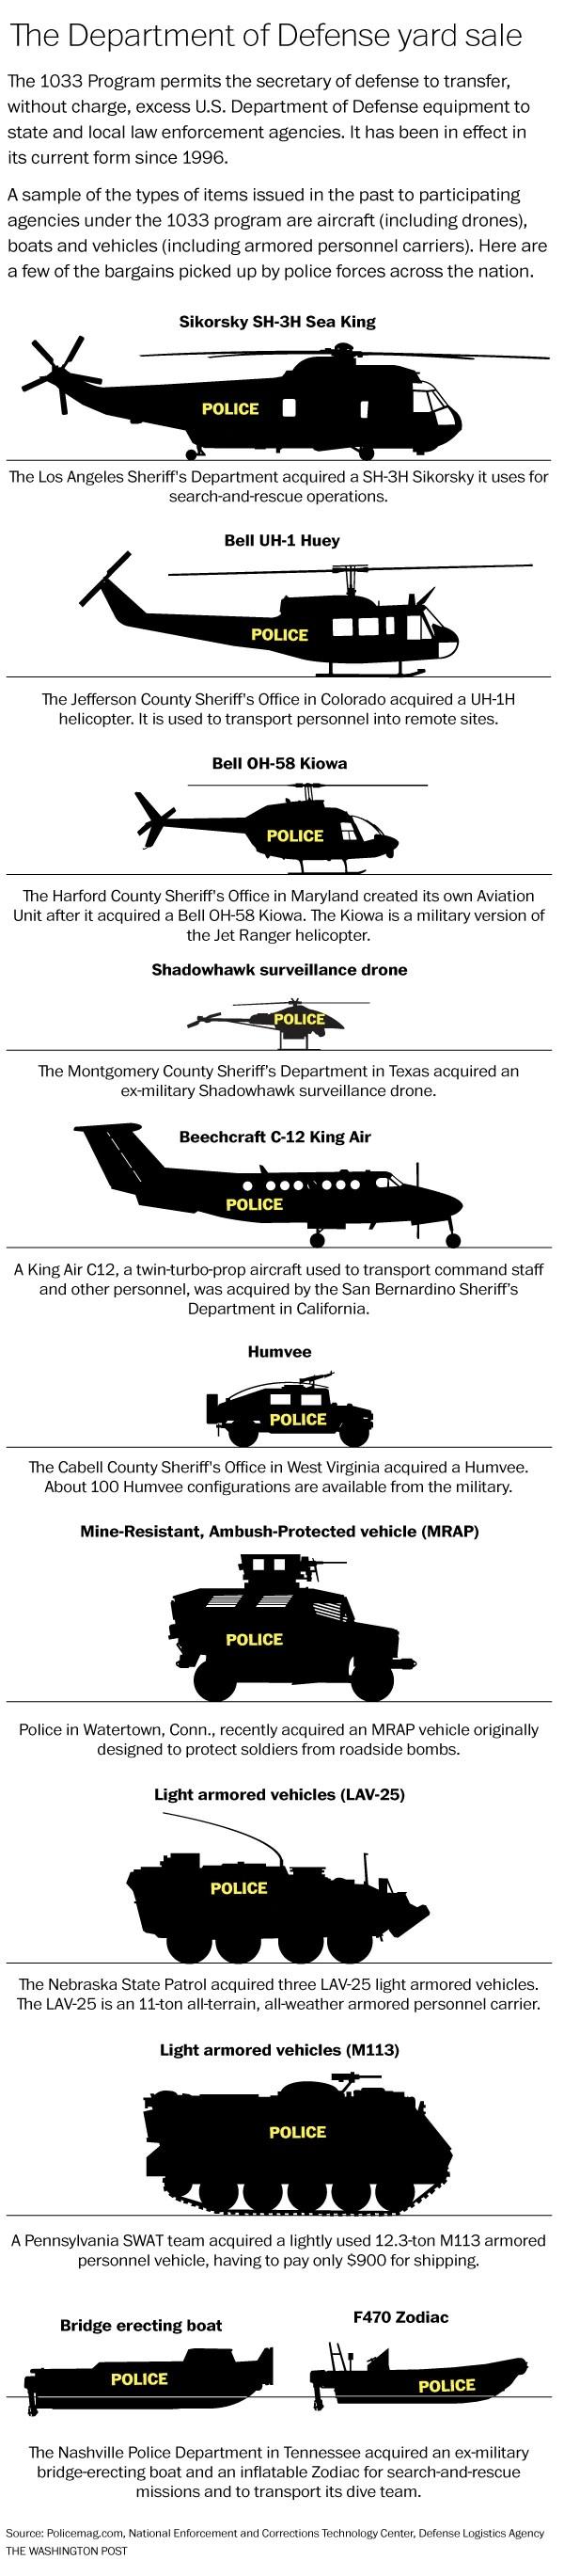 Graphic by Richard Johnson/ The Washington Post